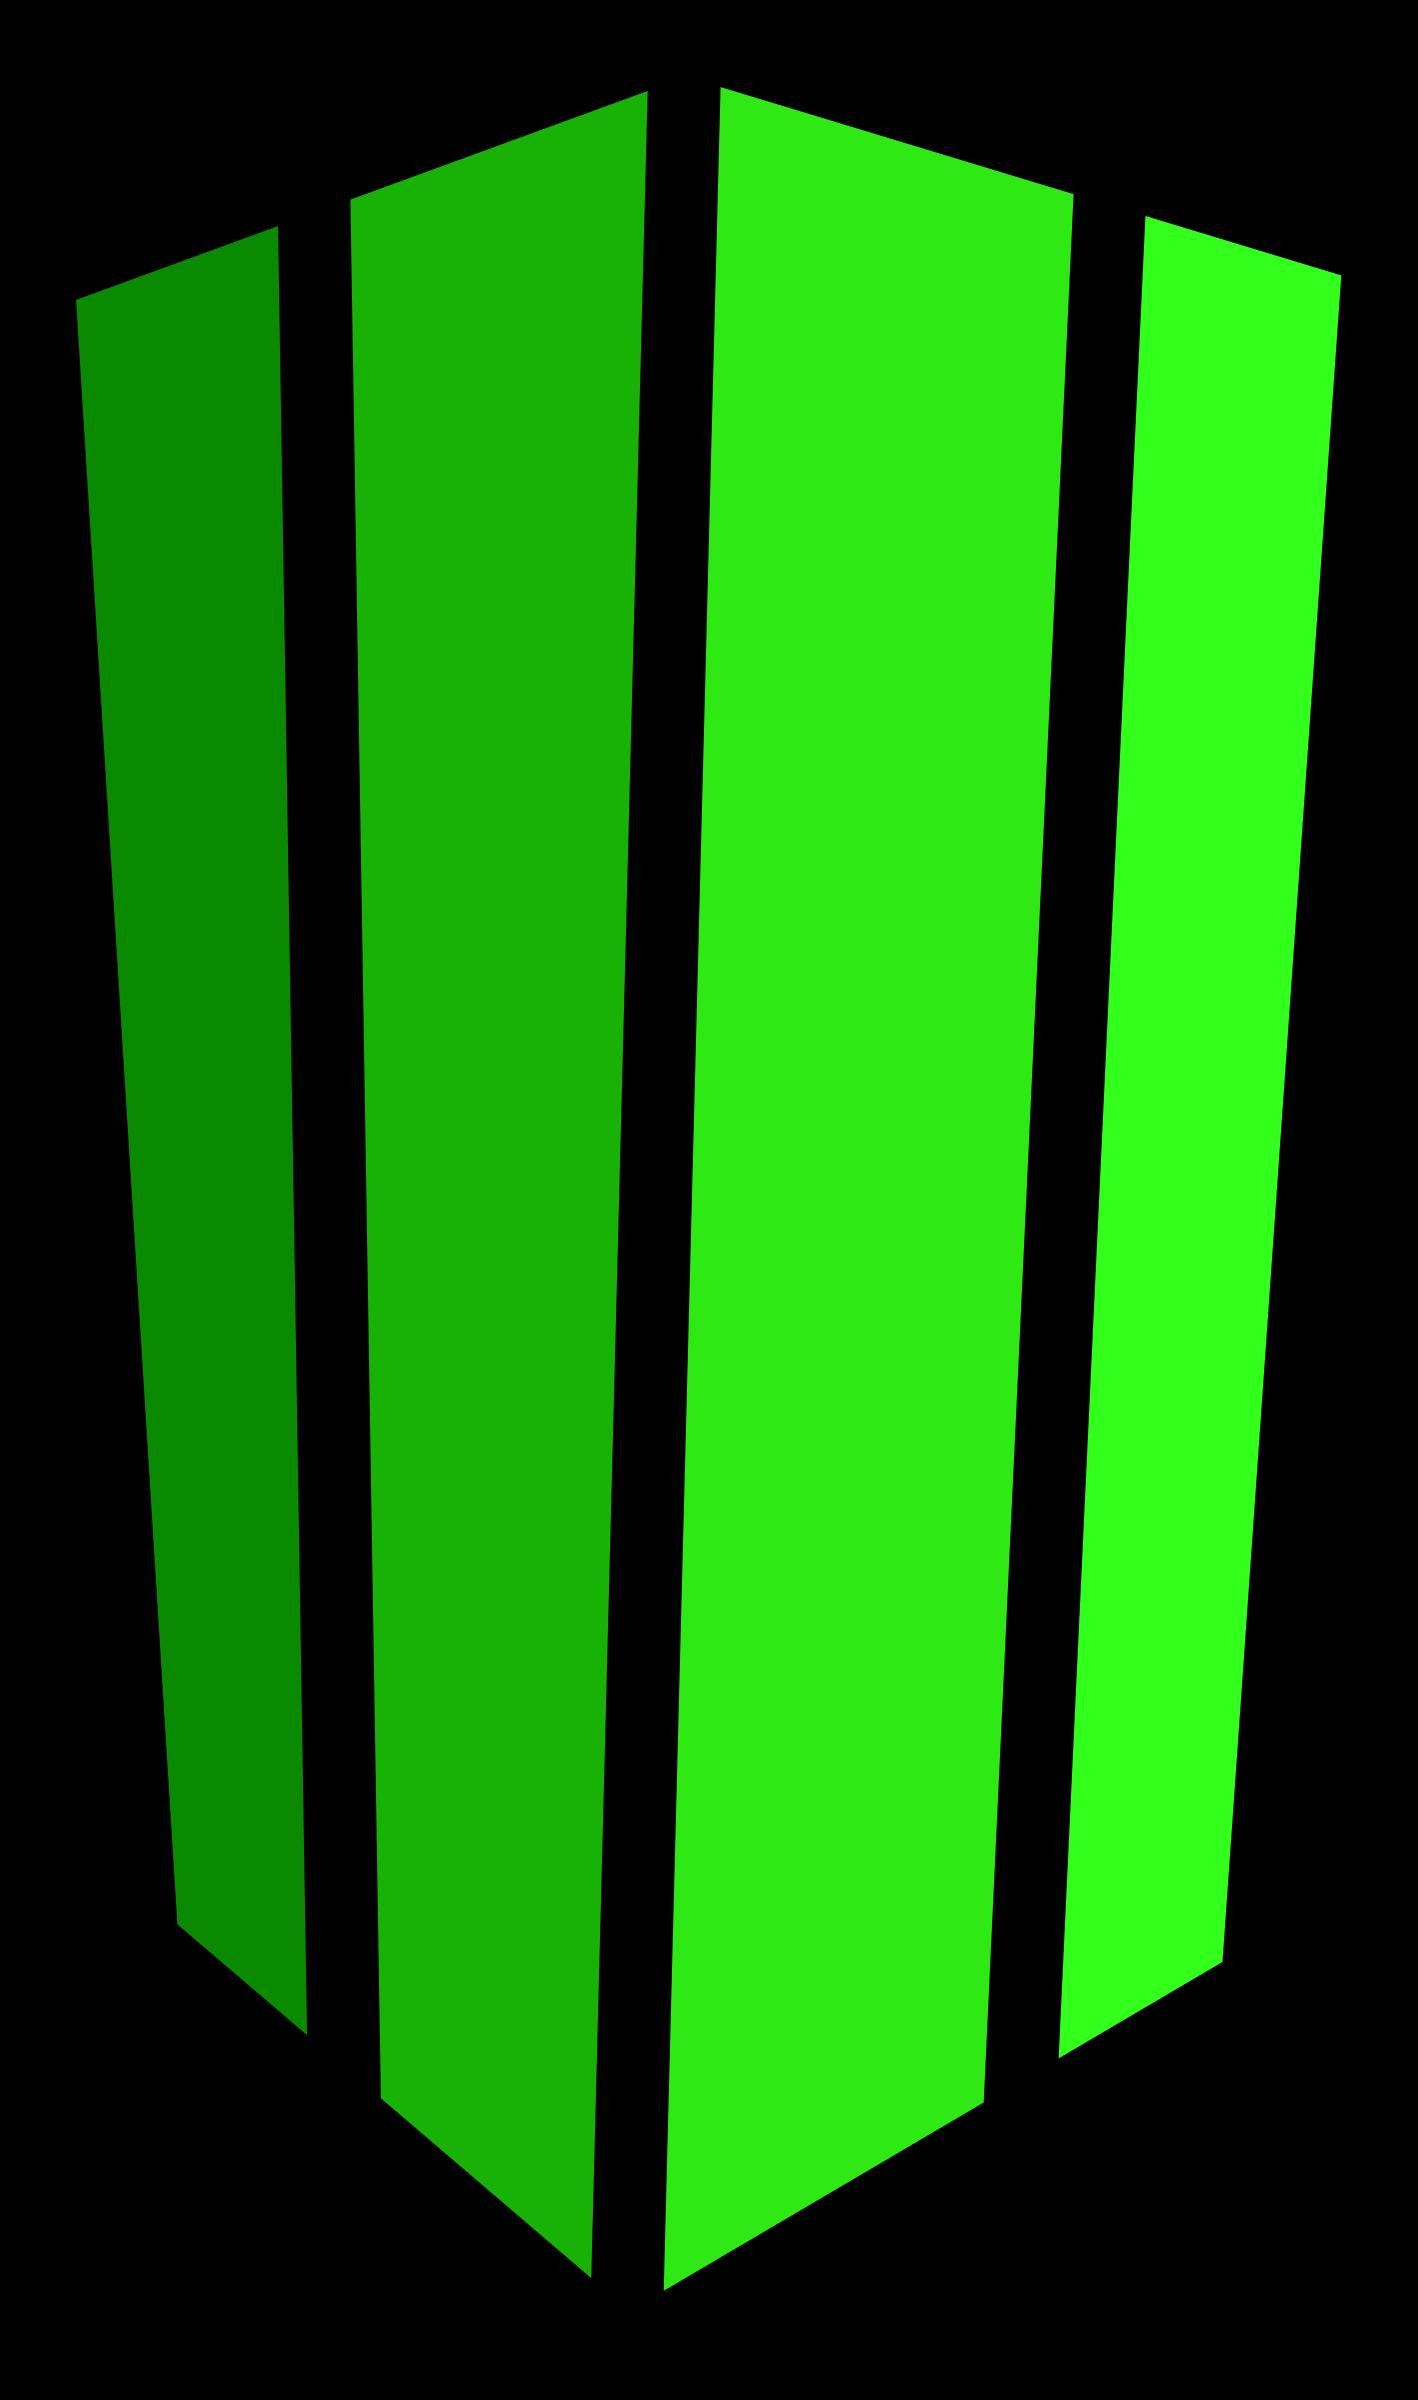 Minecraft Cactus Vector Clipart image.